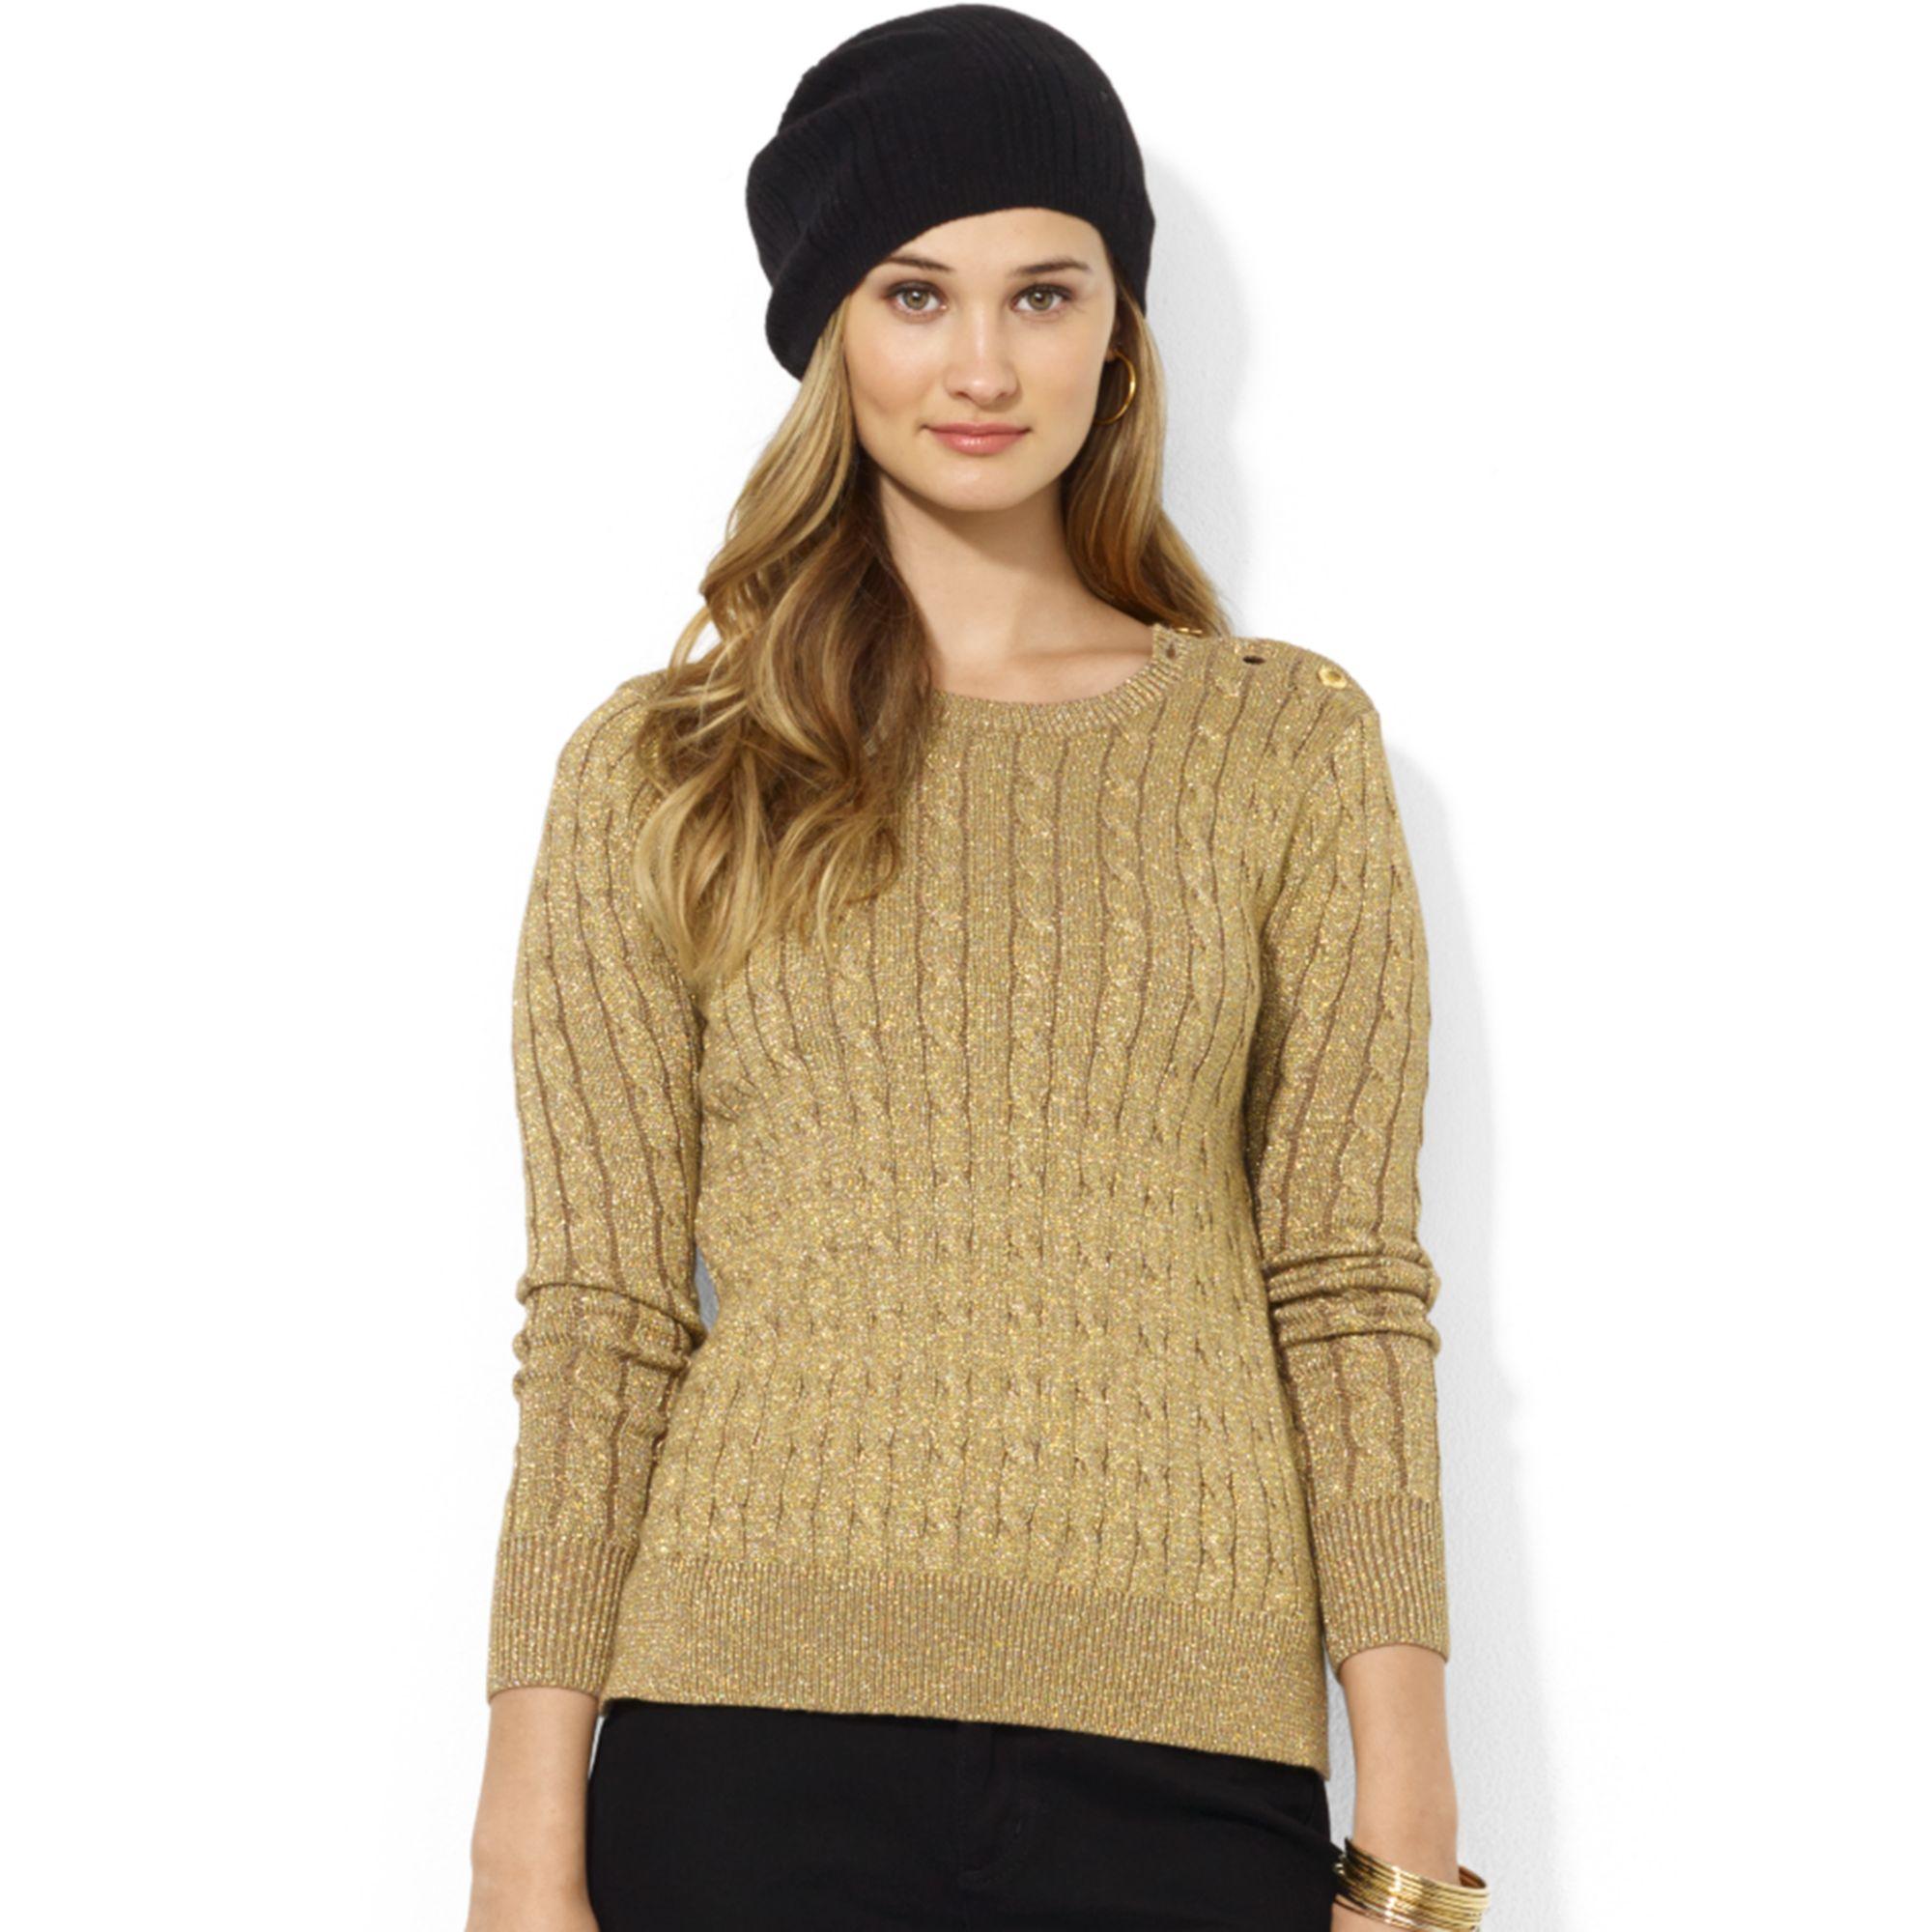 Lauren by ralph lauren Long Sleeve Cable Knit Crewneck Sweater in ...